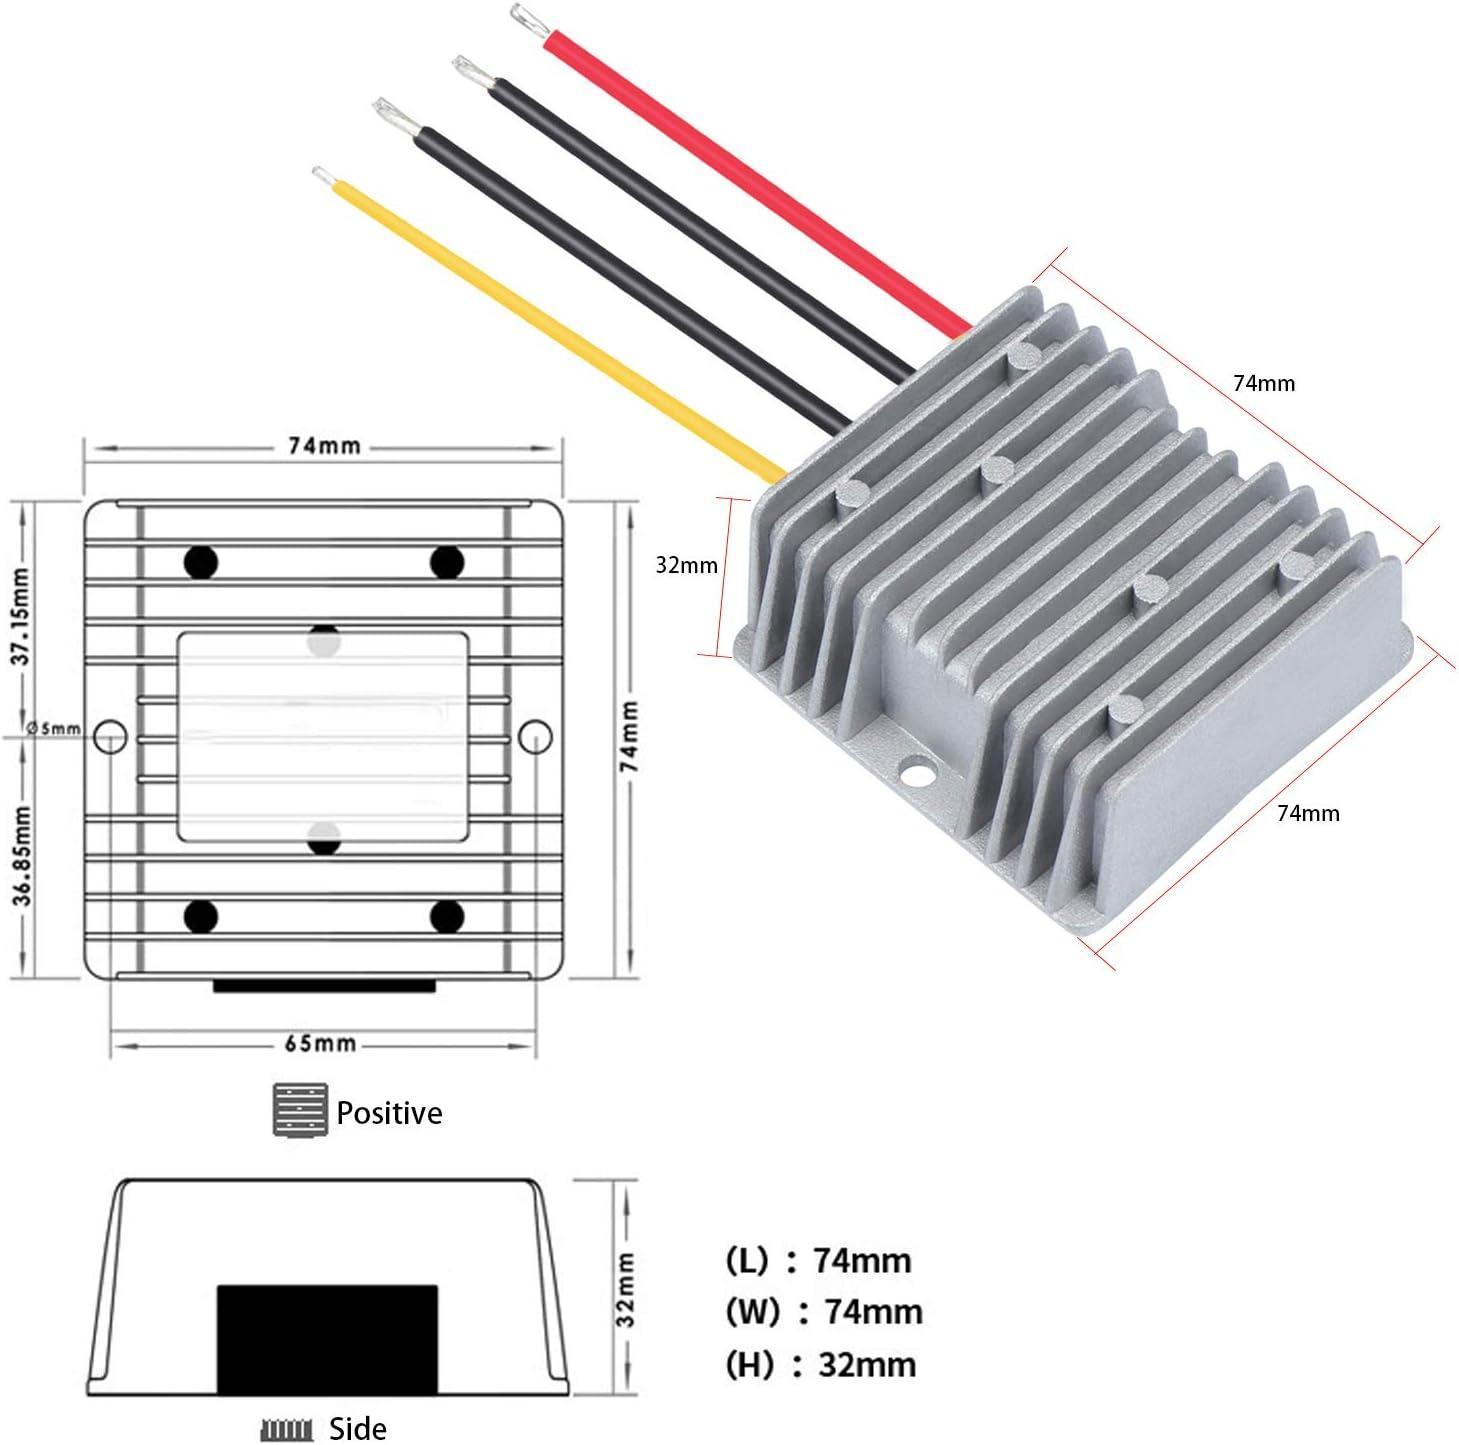 Sistema Solar Barco regulador Reductor de Voltaje para Coche Aussel DC 24 V a DC 12 V convertidor de Bajada Transformador de 20 A 240 W cami/ón